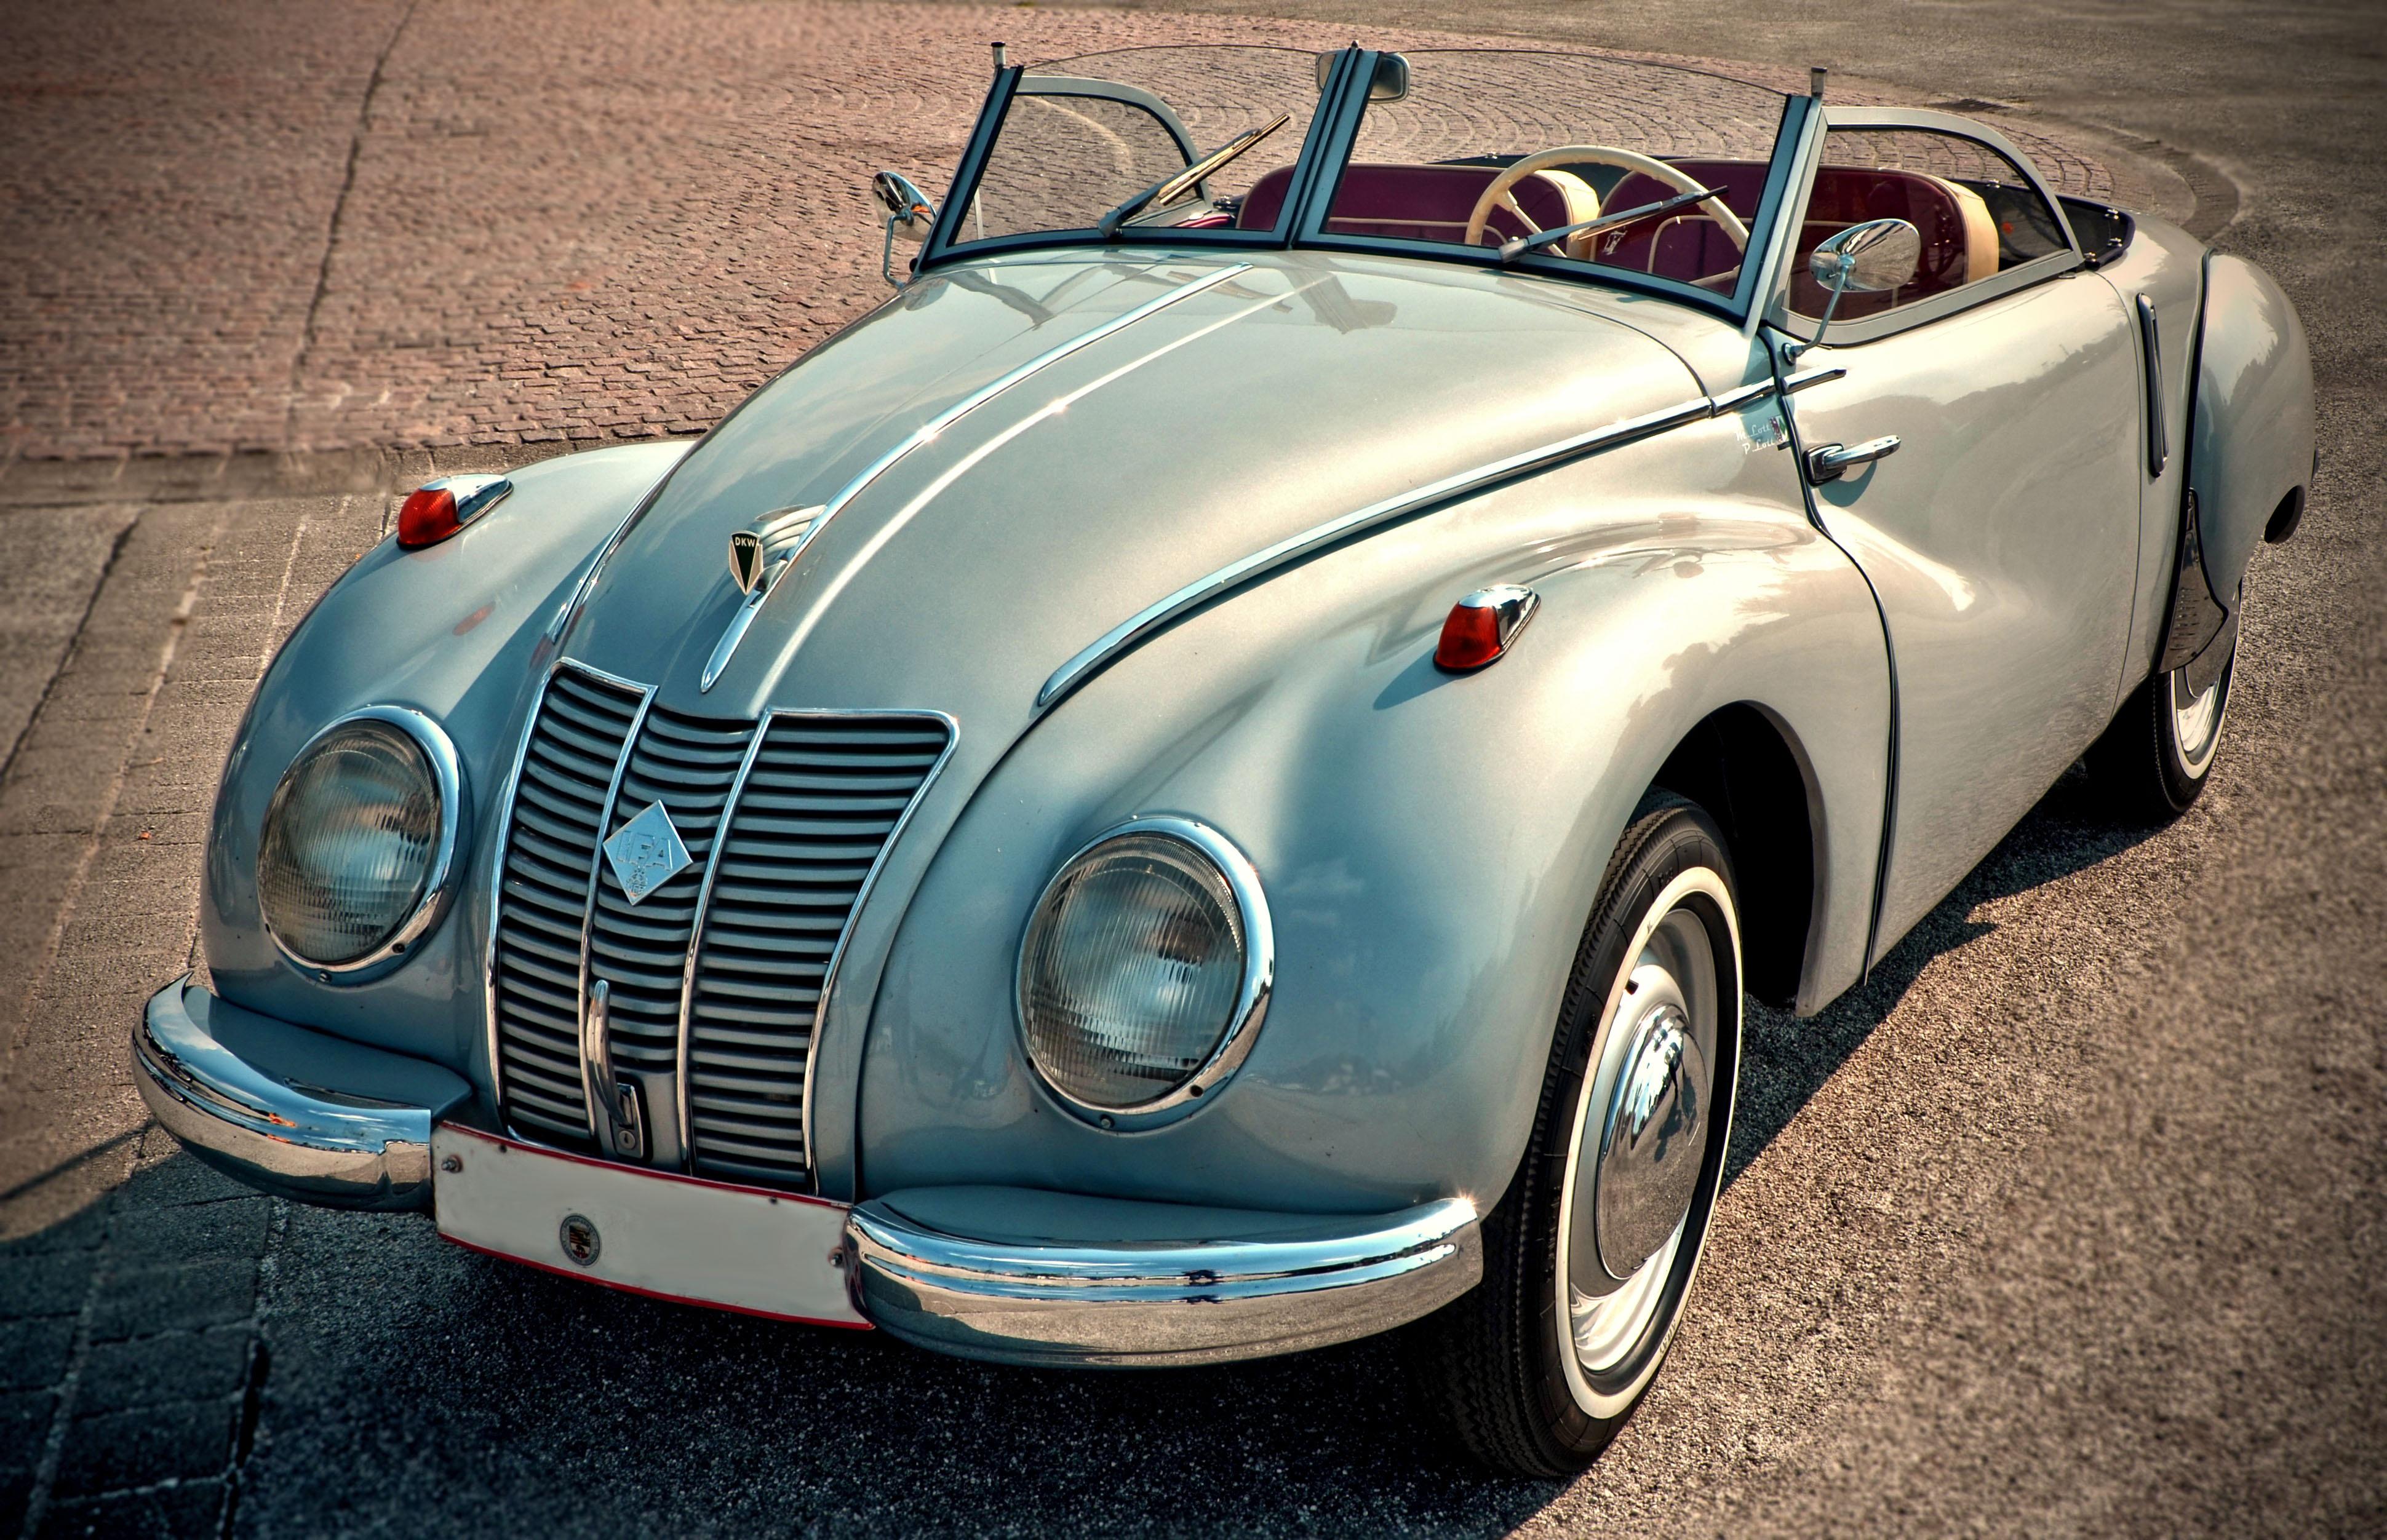 Free Images : retro, old, auto, sports car, satellite, motor ...